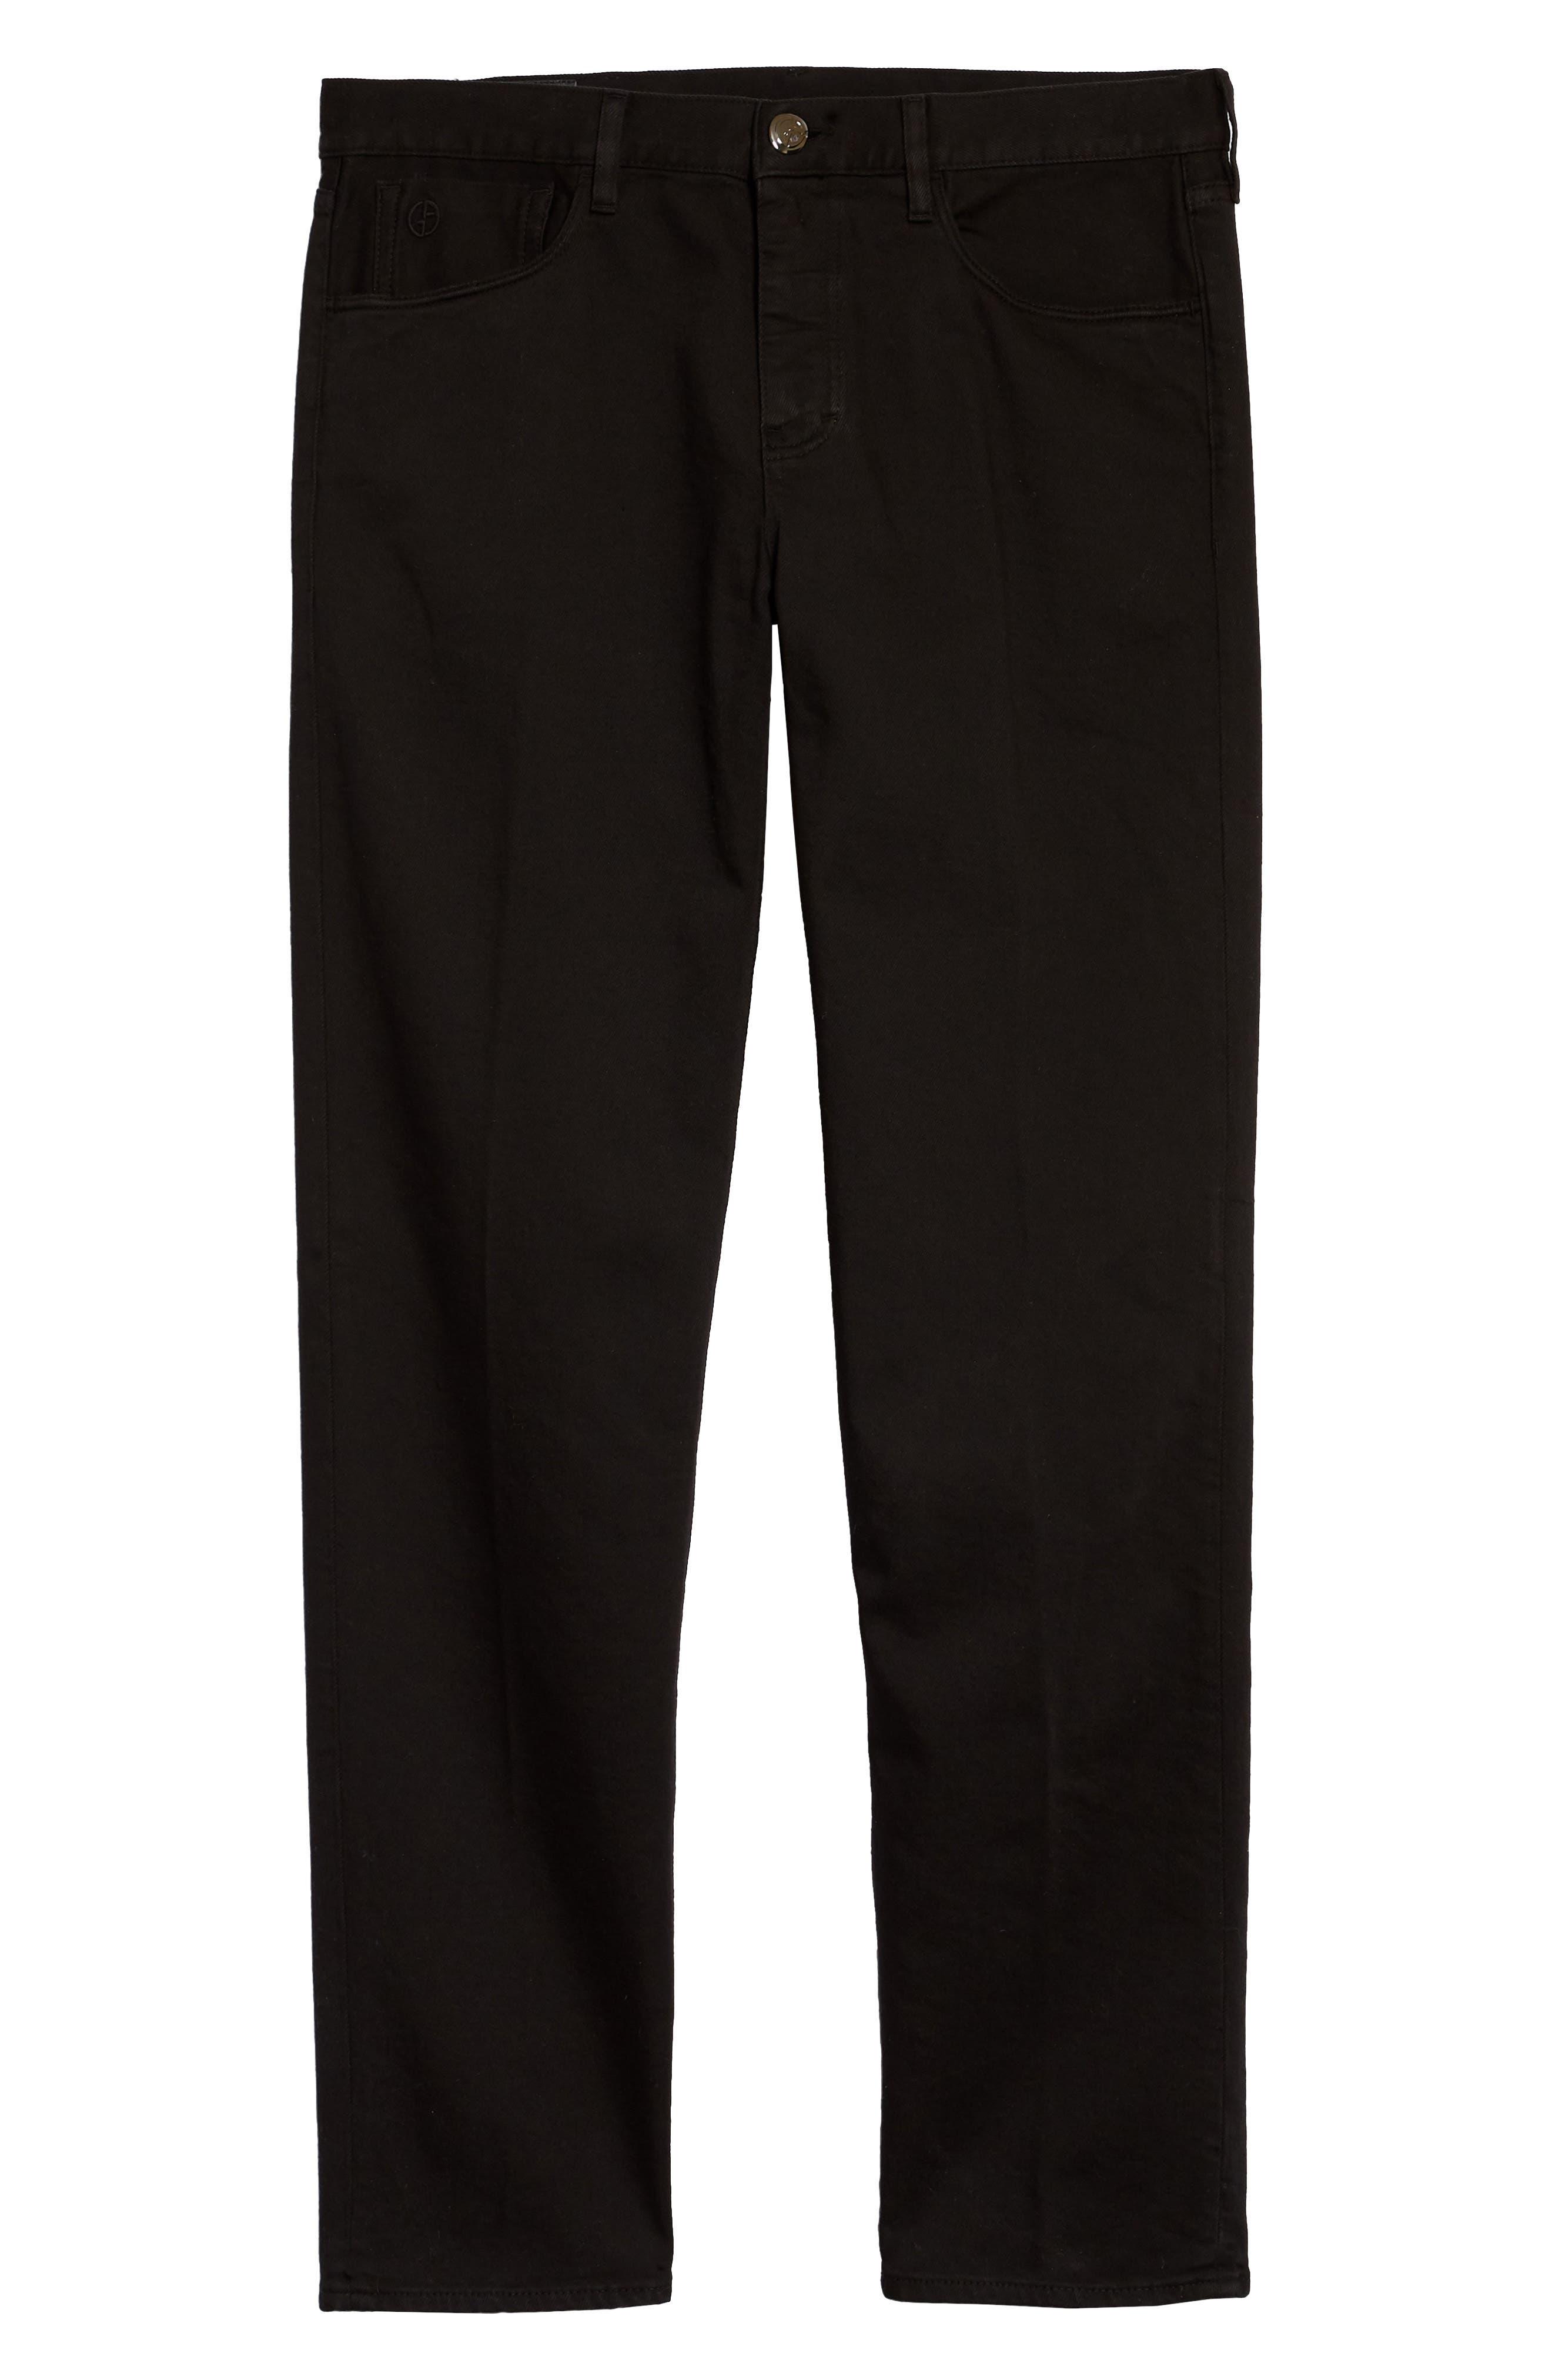 Men's Giorgio Armani Slim Fit Garbardine Jeans,  32R EU - Black